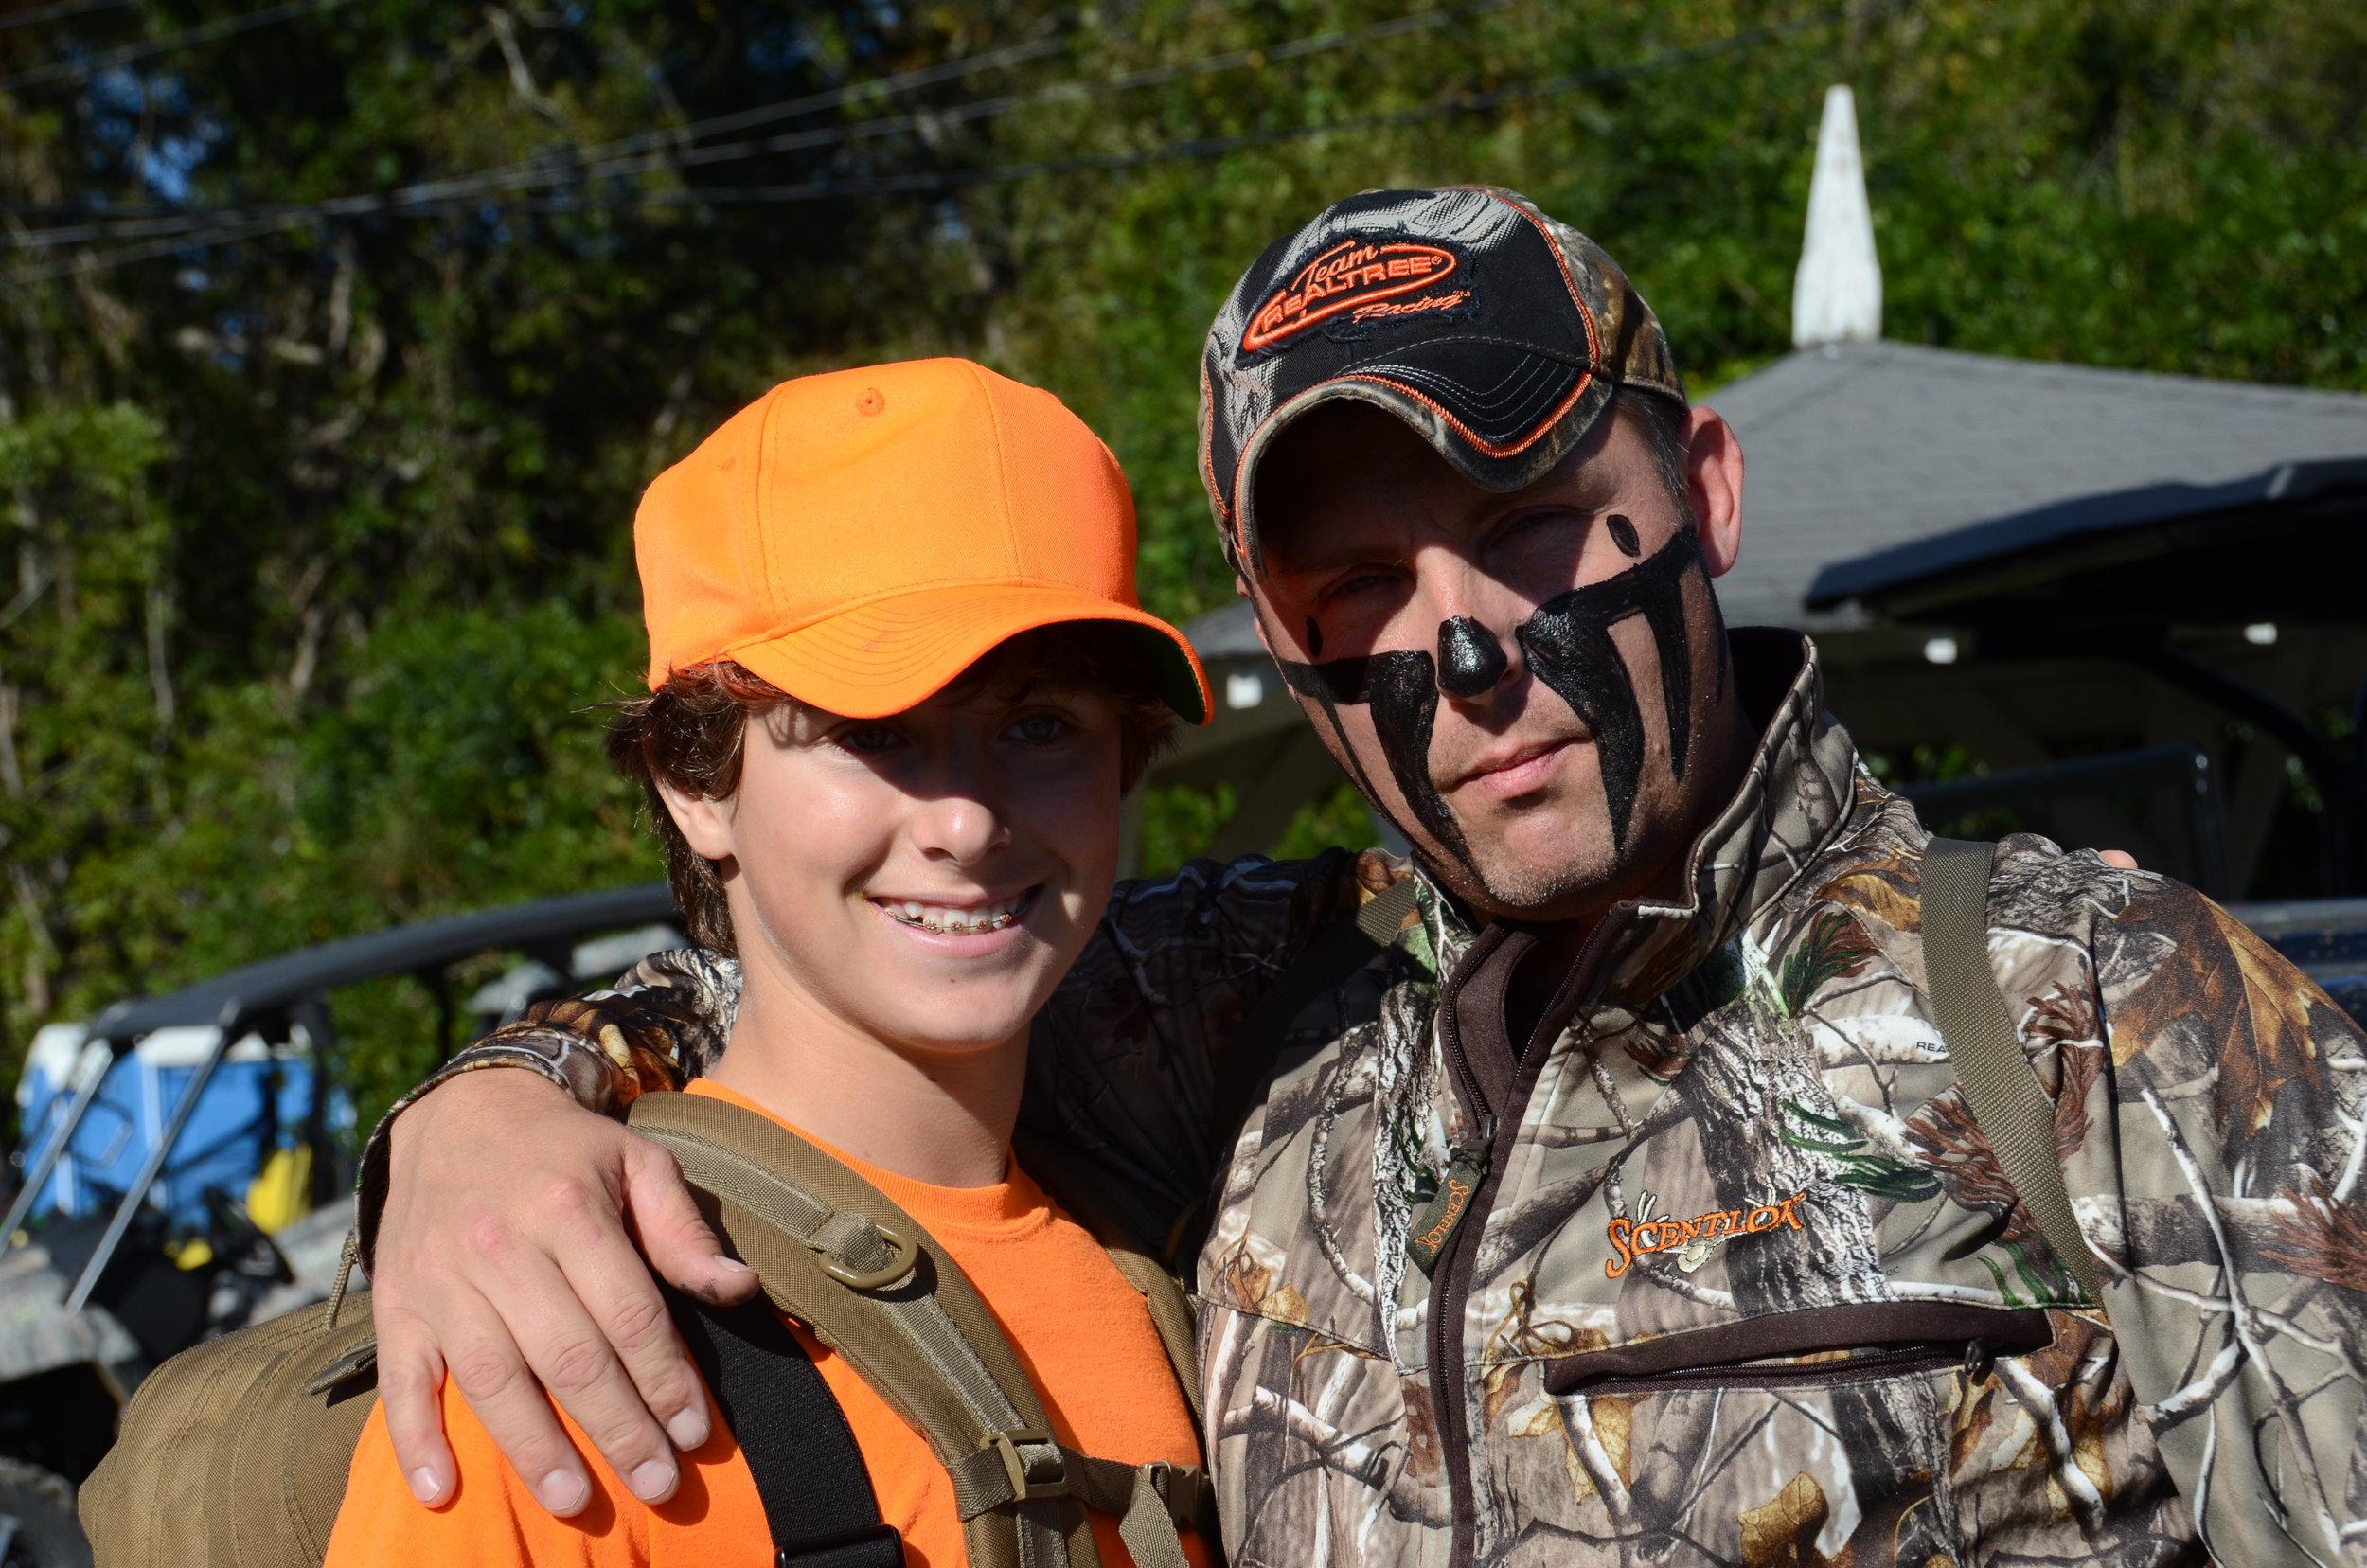 D7 9080 2017 Nov 10 Bo and Dak ready for hunt Iron Horse Farm near Marion AL.JPG